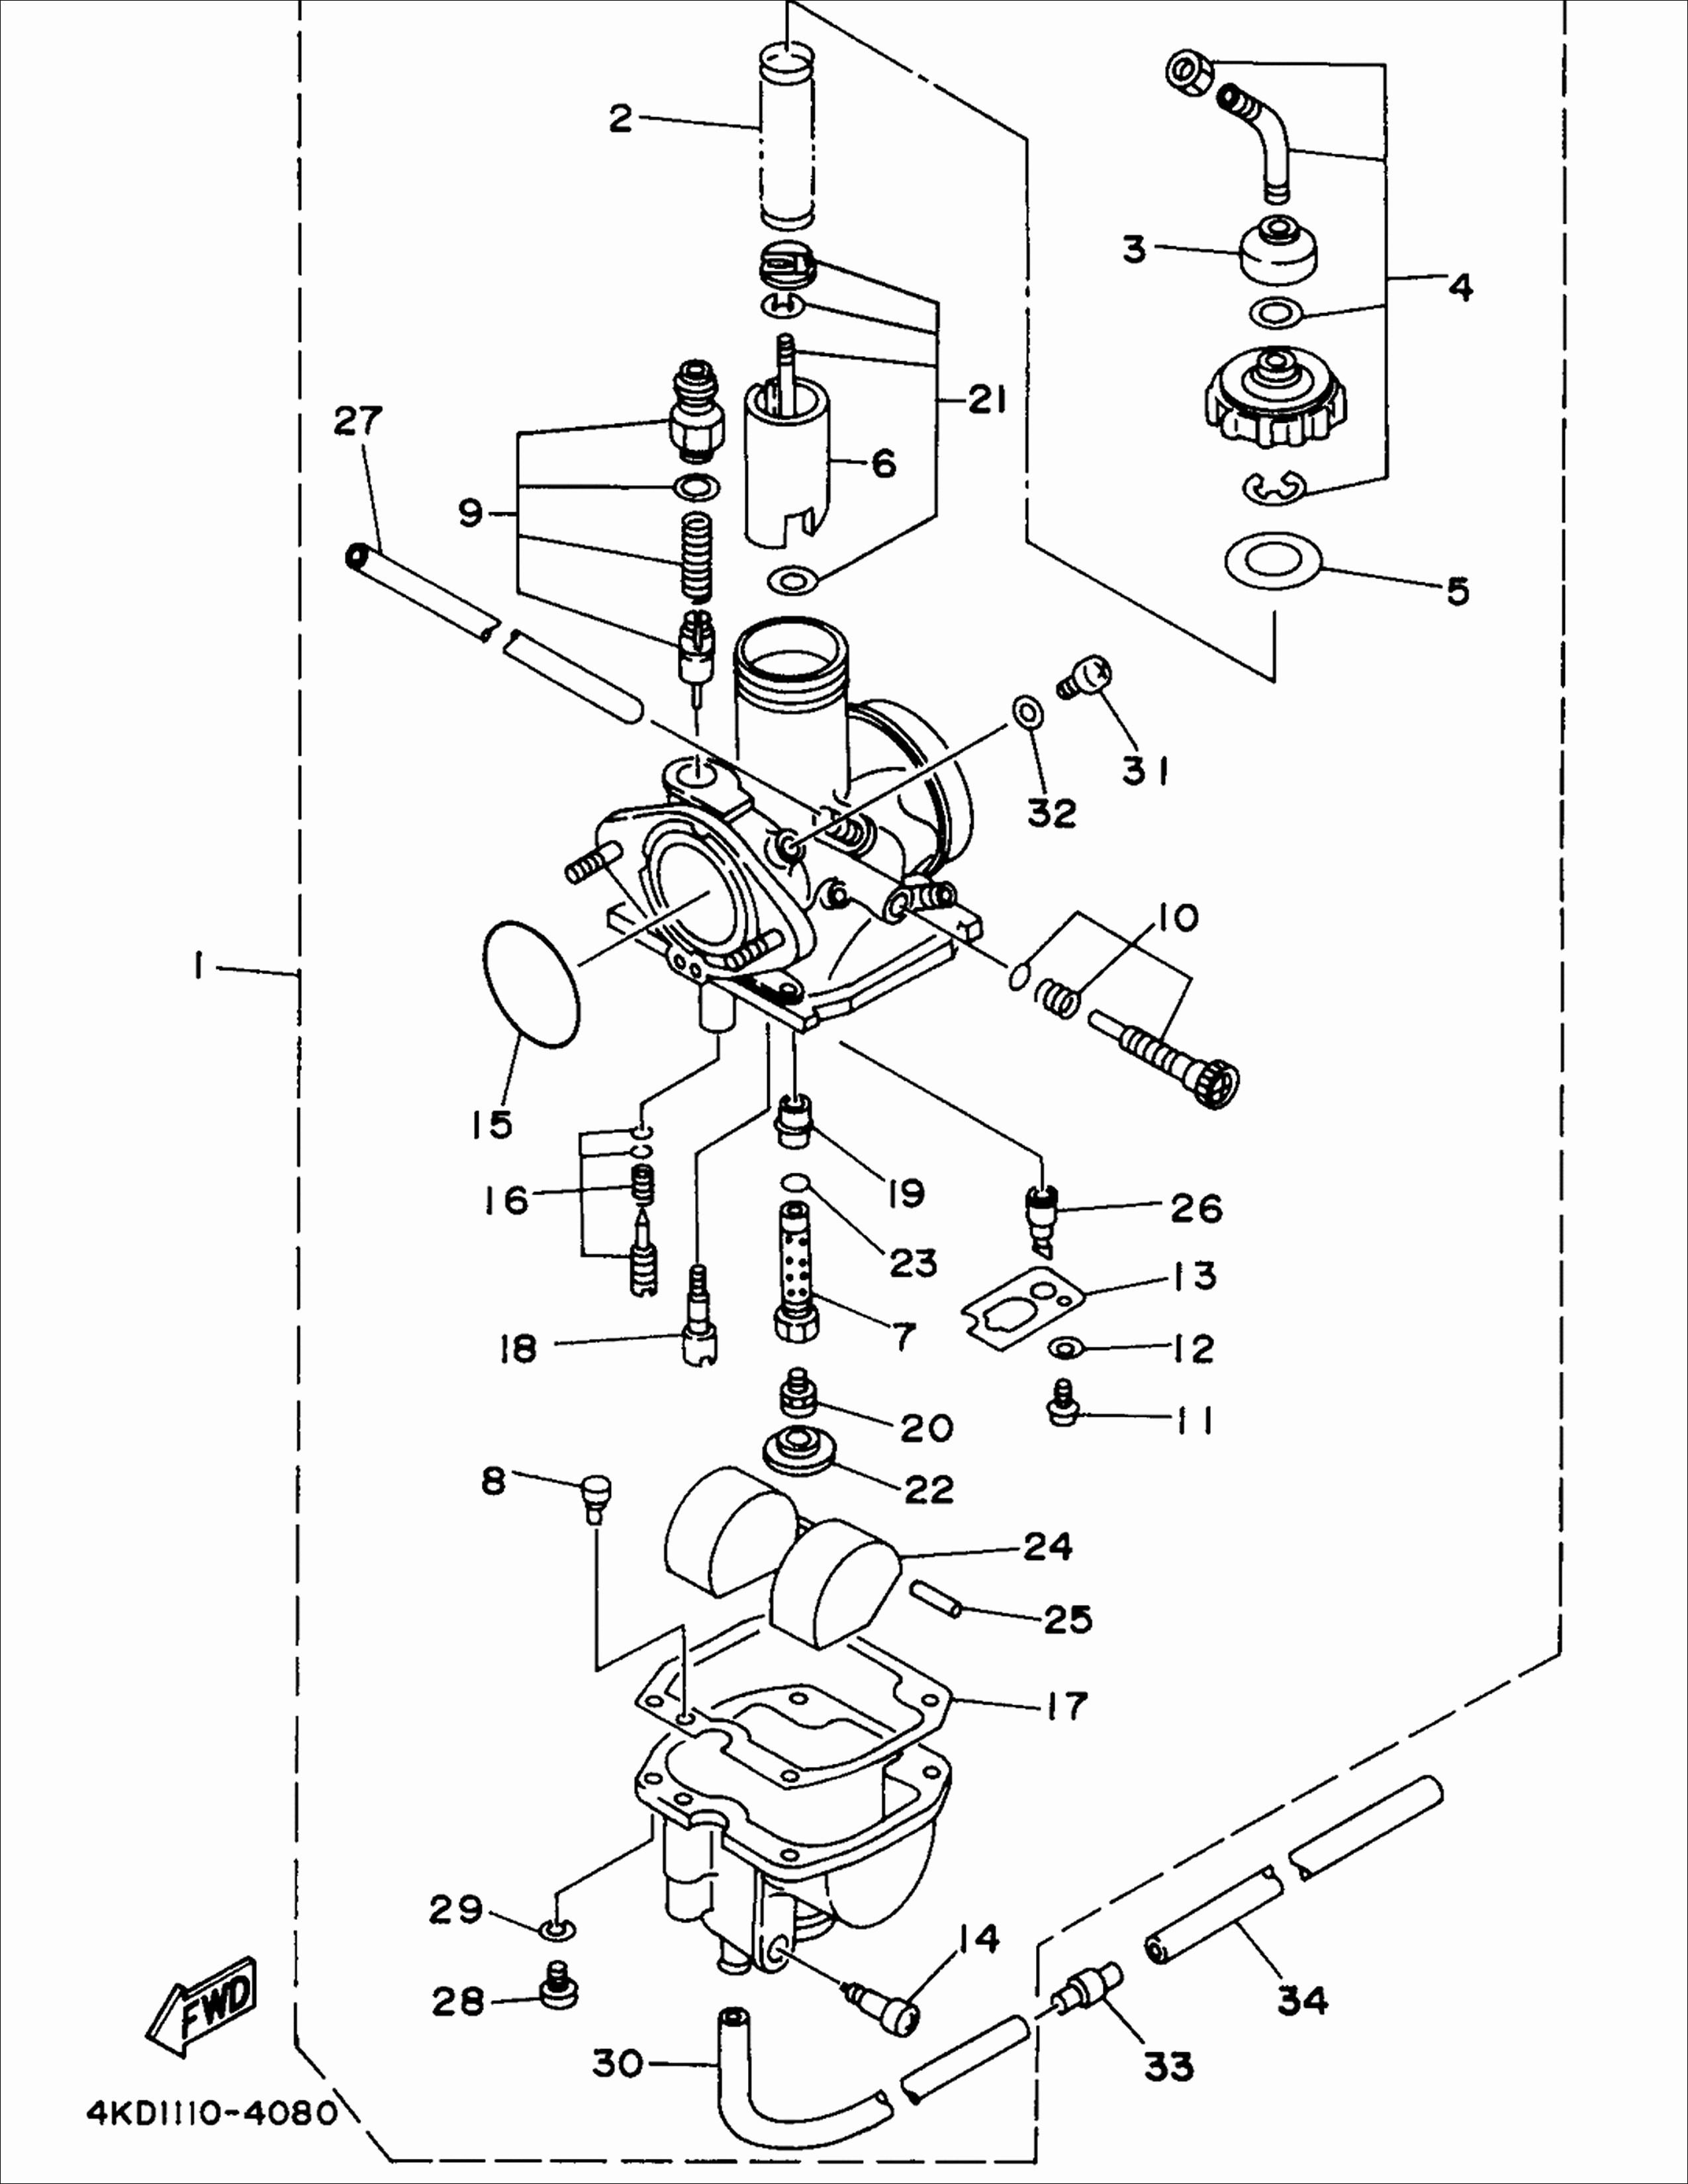 2002 mitsubishi diamante engine diagram wiring diagram rh 01 eile achtsam de